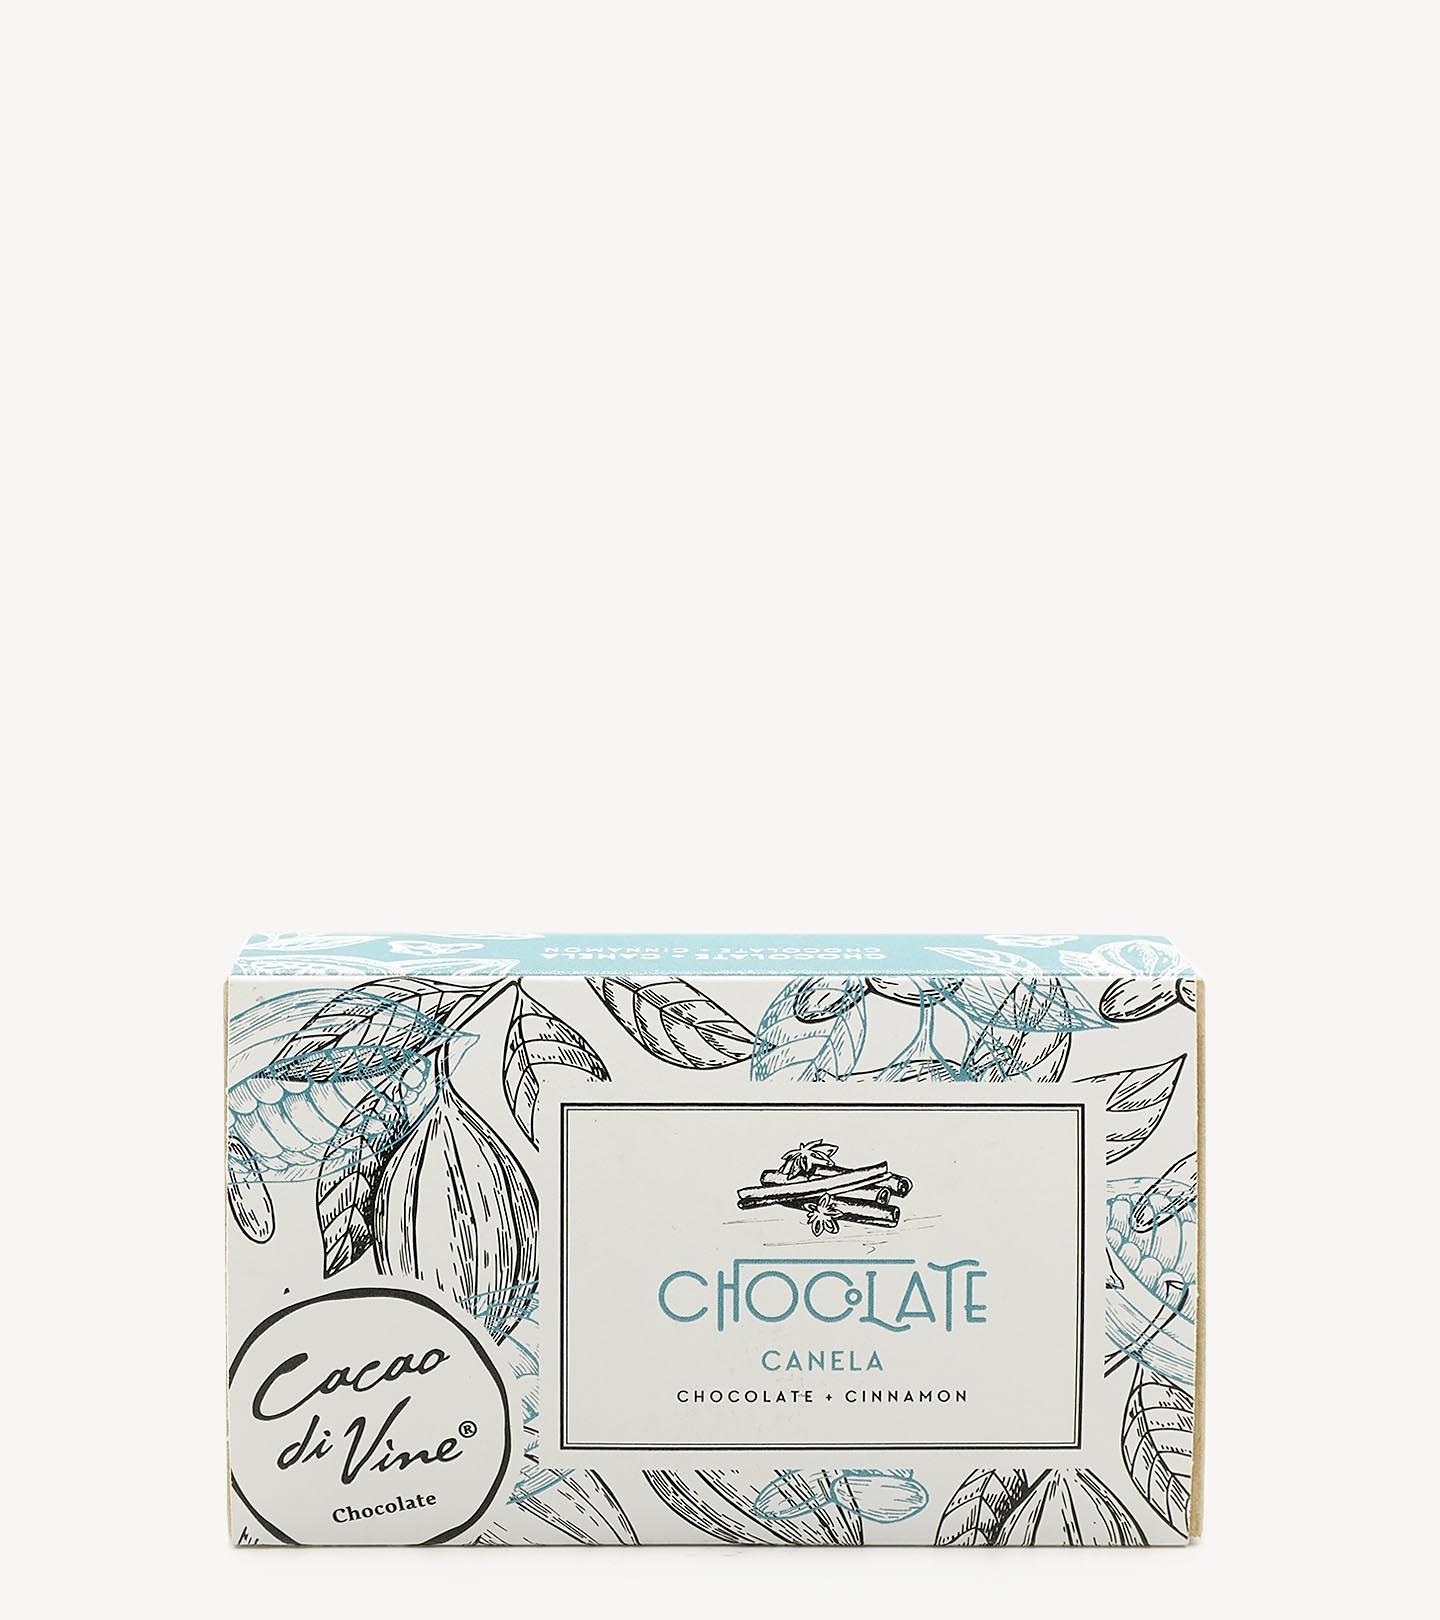 Bombons de Chocolate Negro c/ Canela CacaoDivine 75g